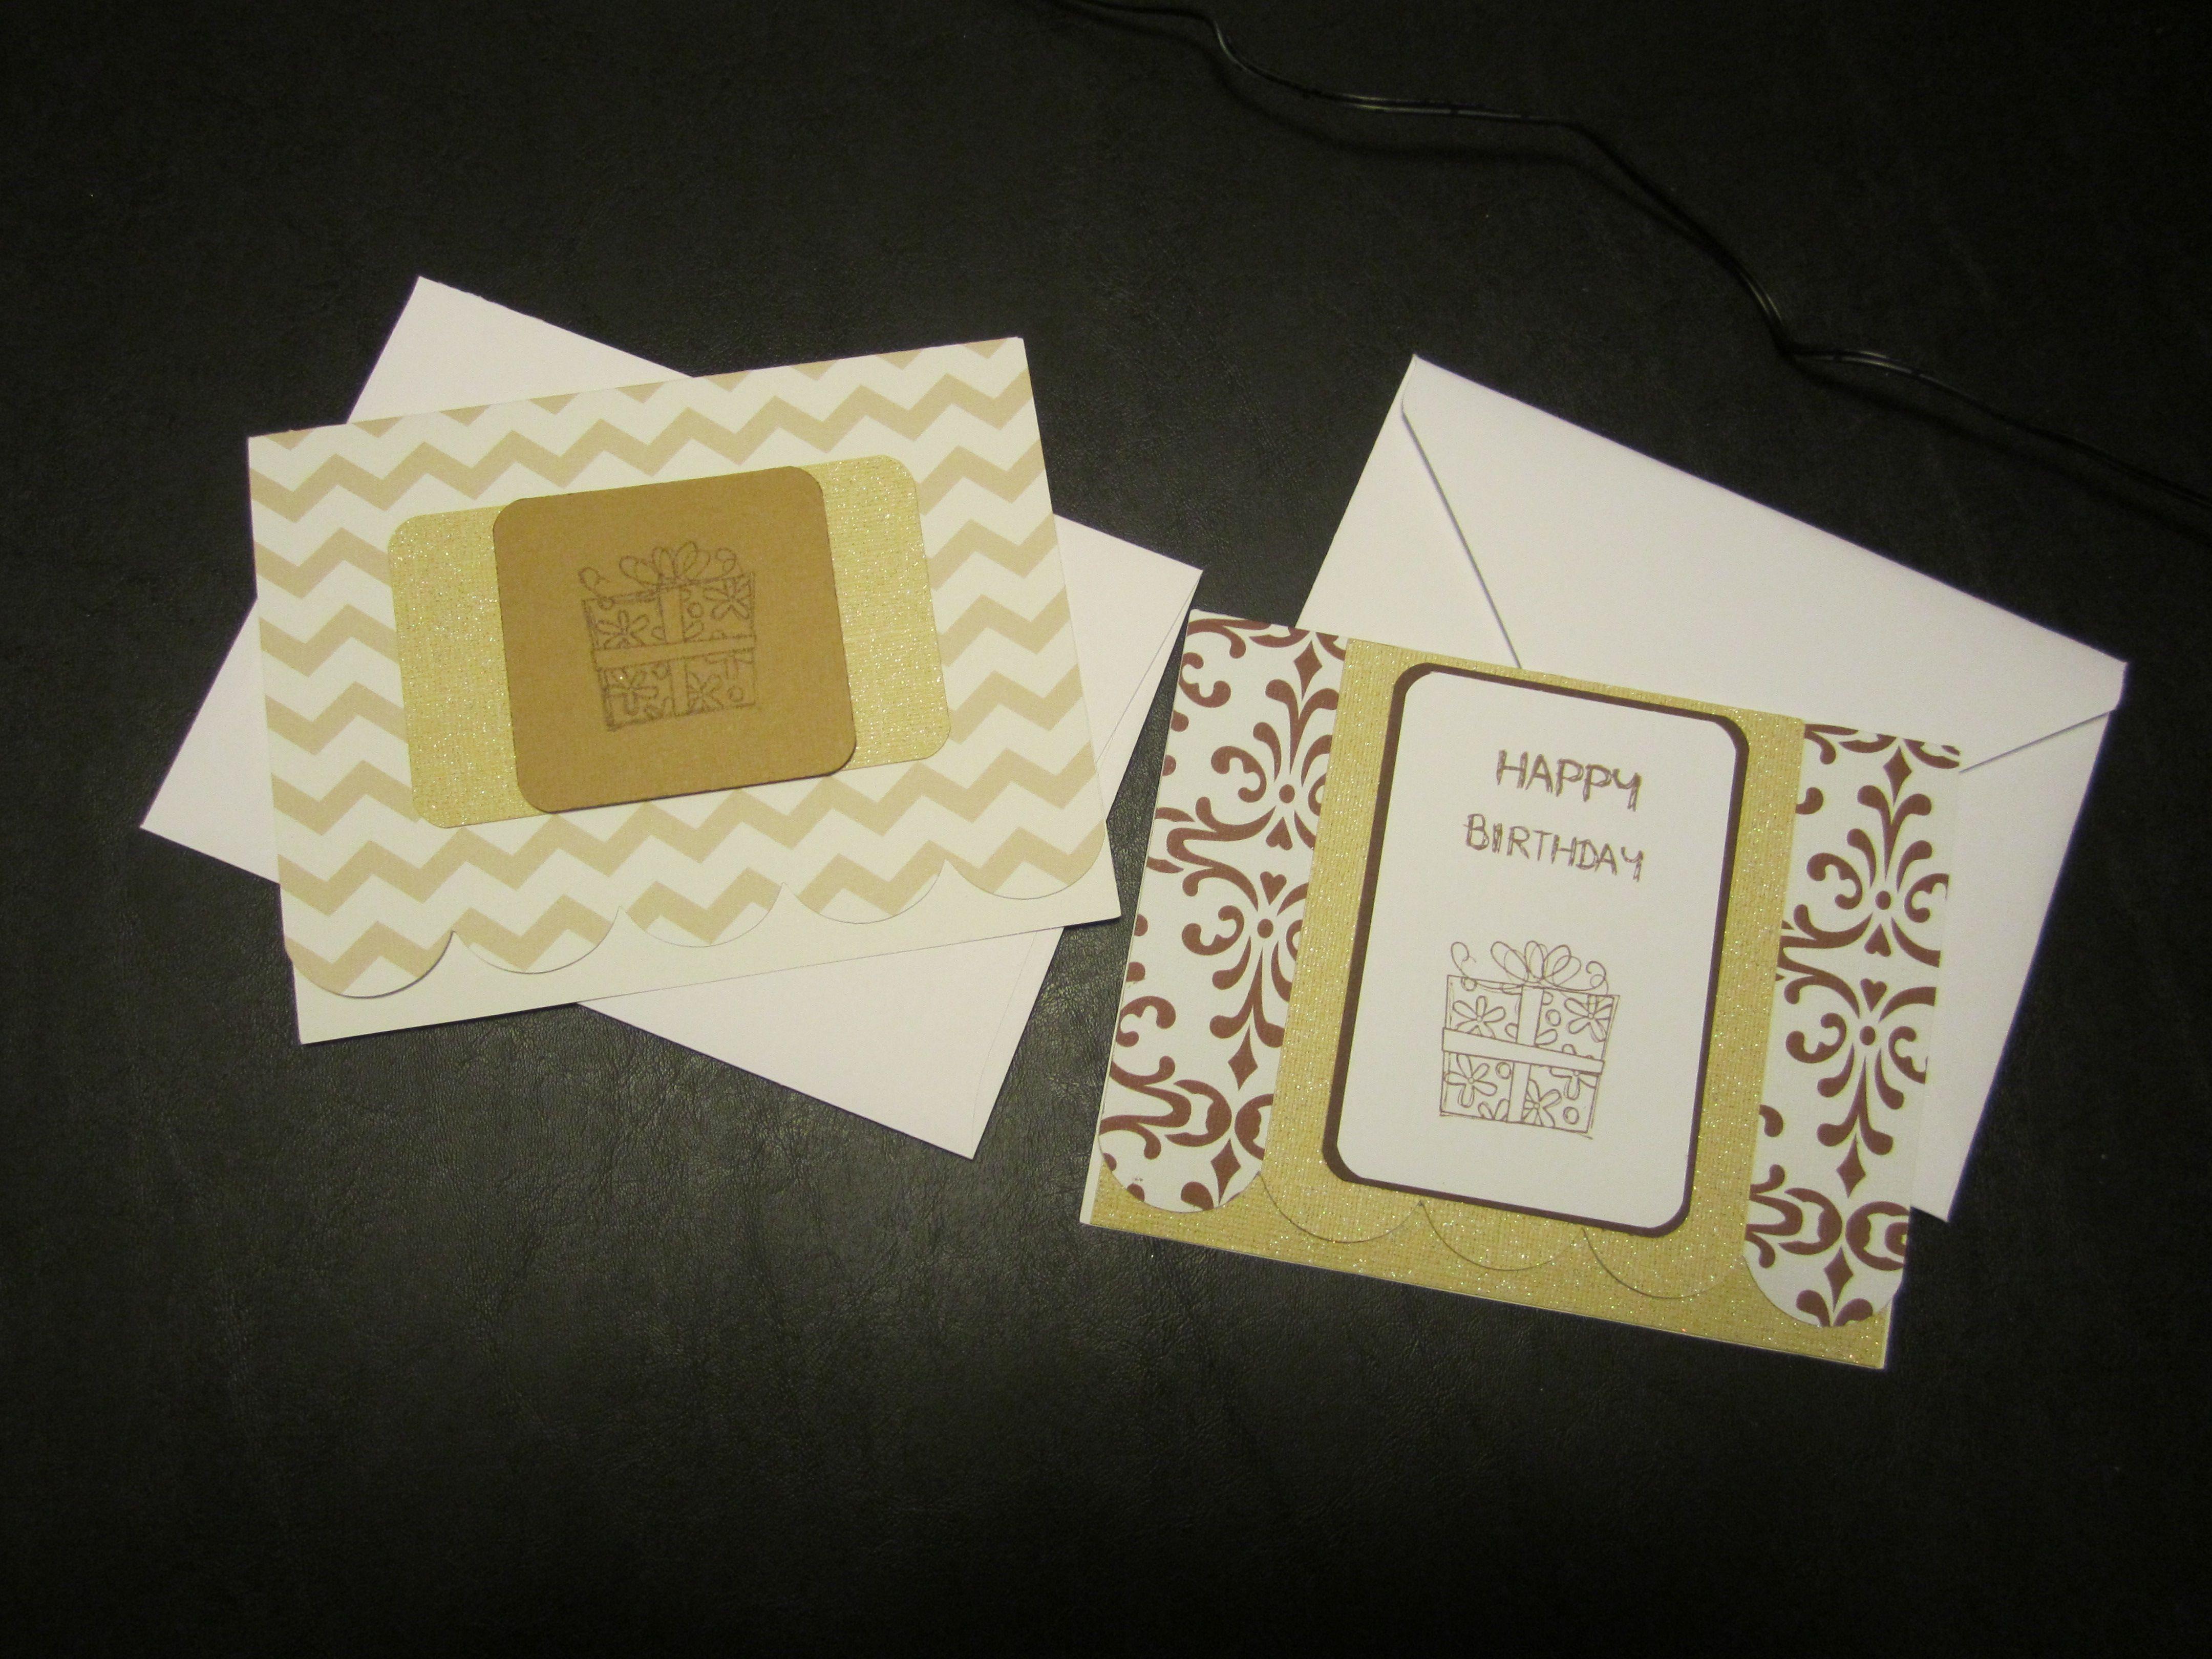 Birthday cards using the cricut creative card cartridge. my cricut